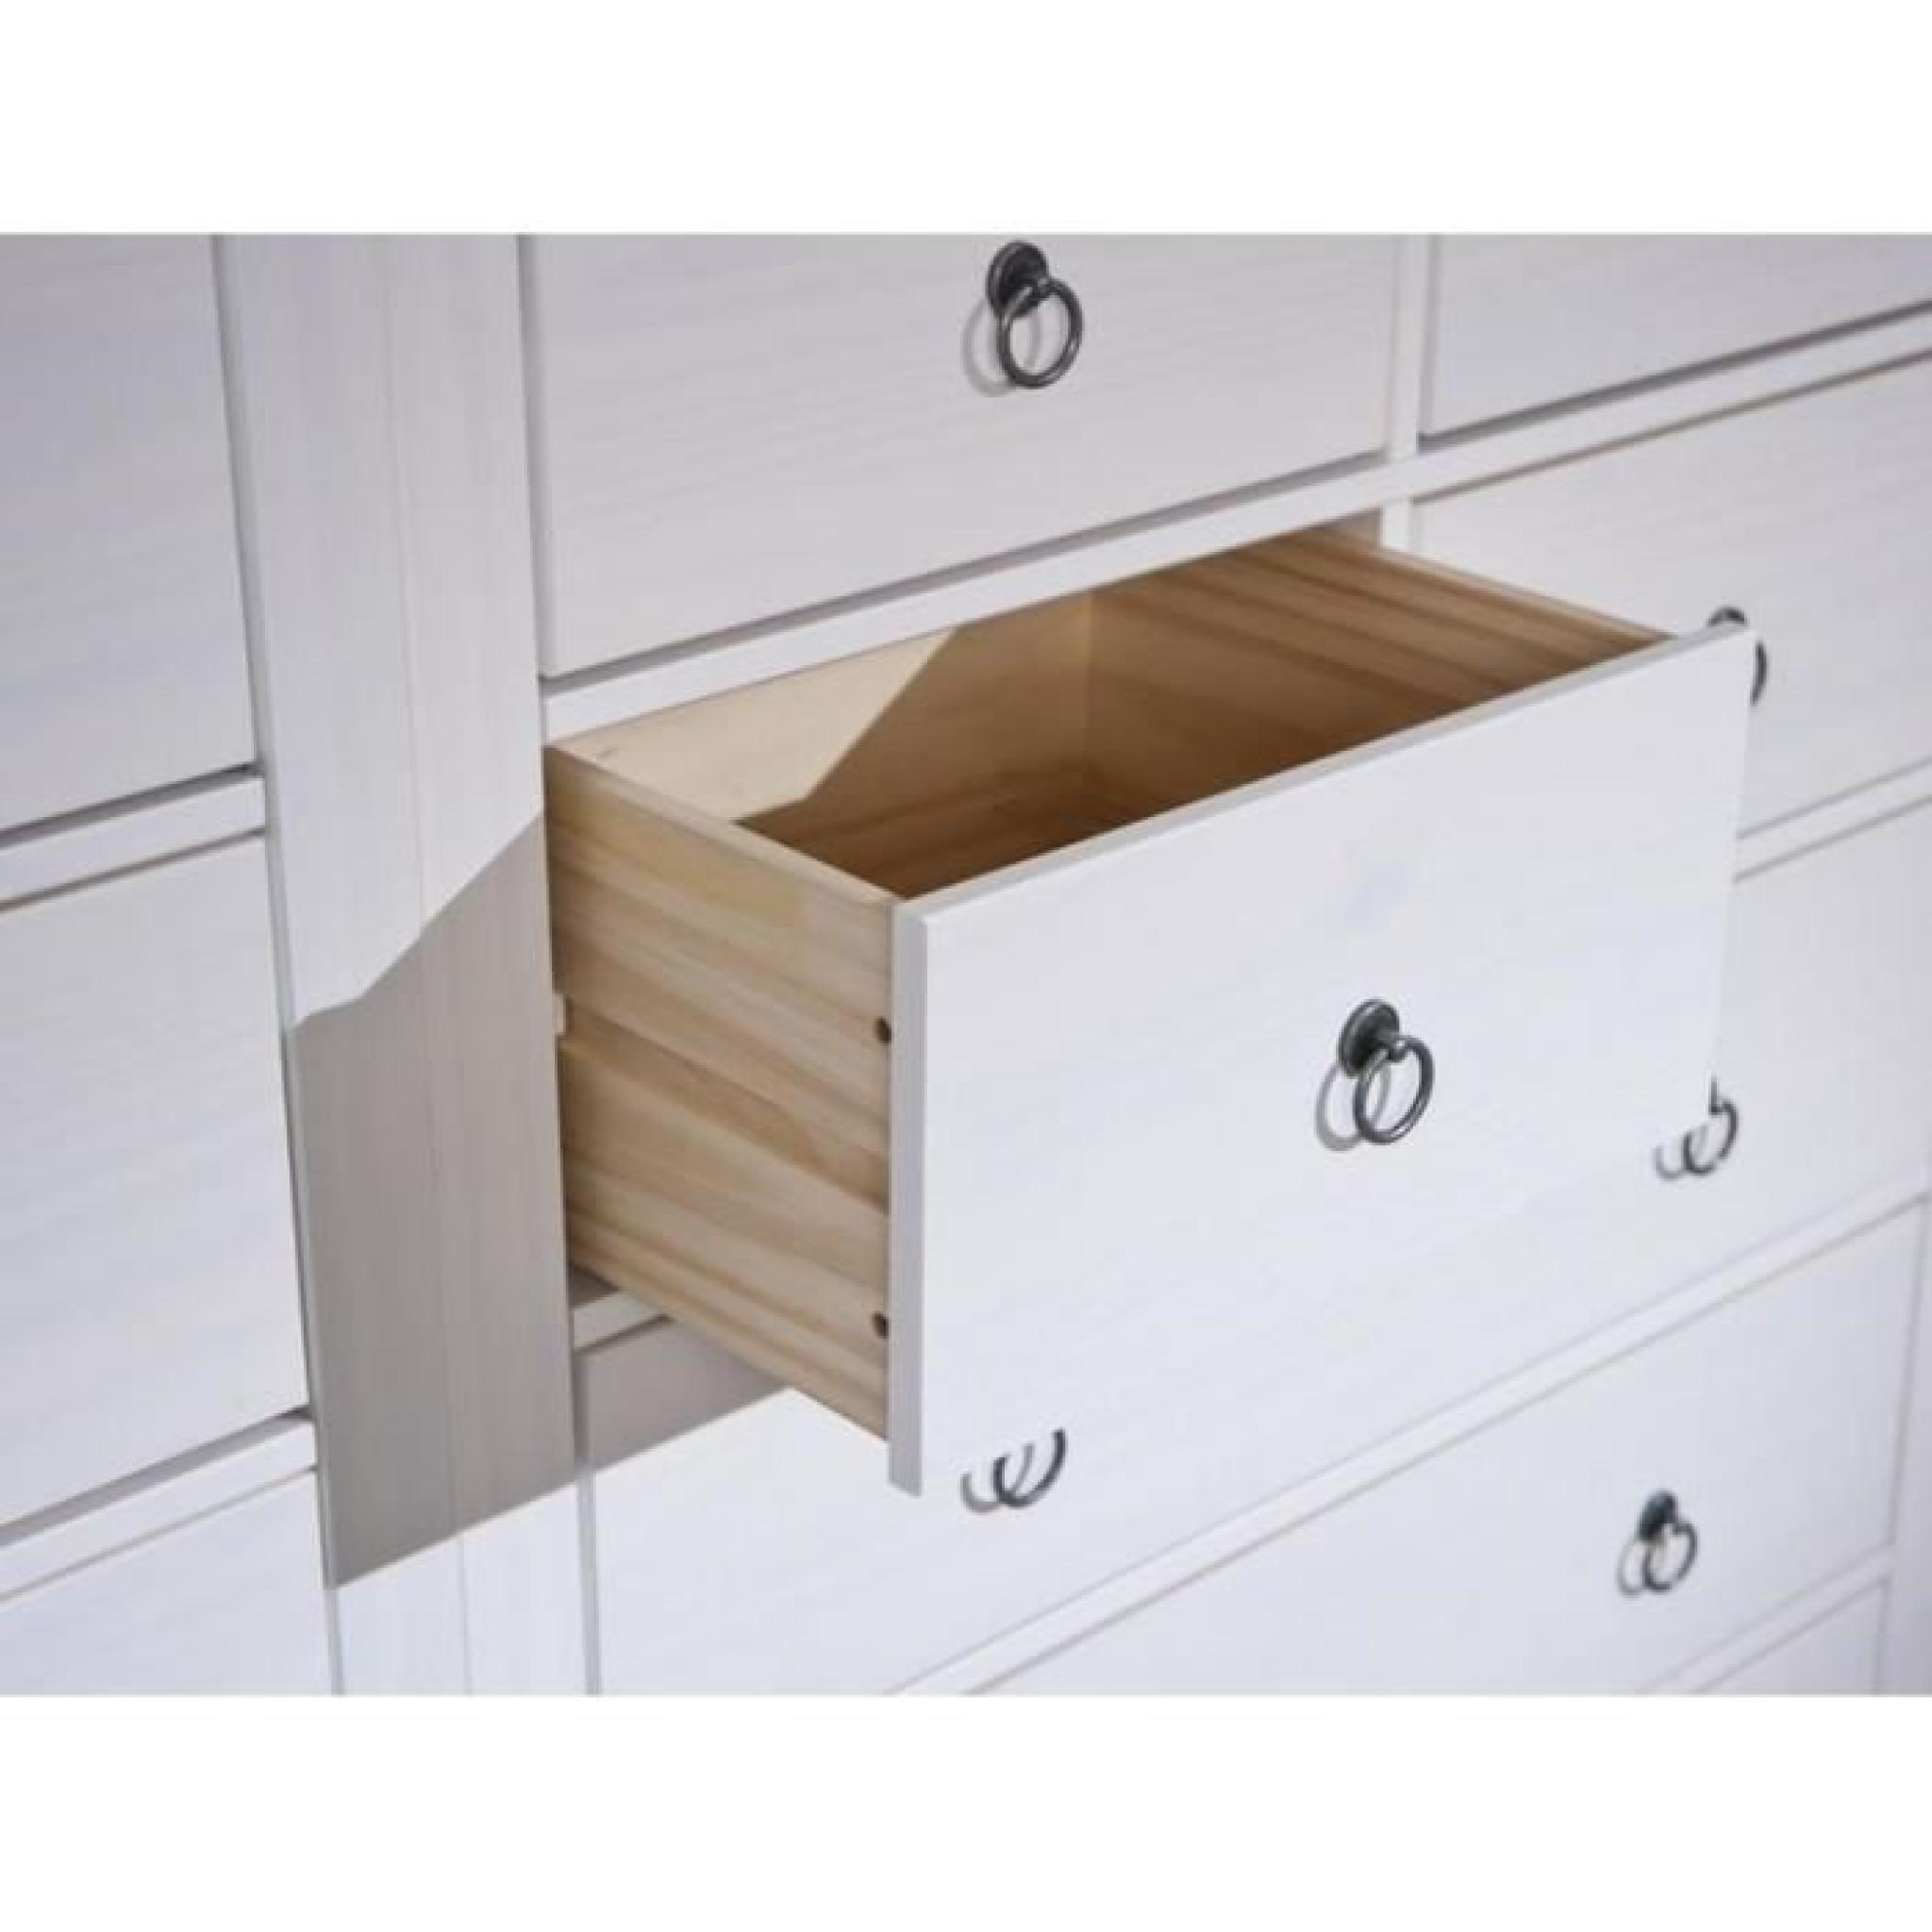 Commode provence blanche 7 tiroirs en pin massif achat - Commode tiroir pas cher ...